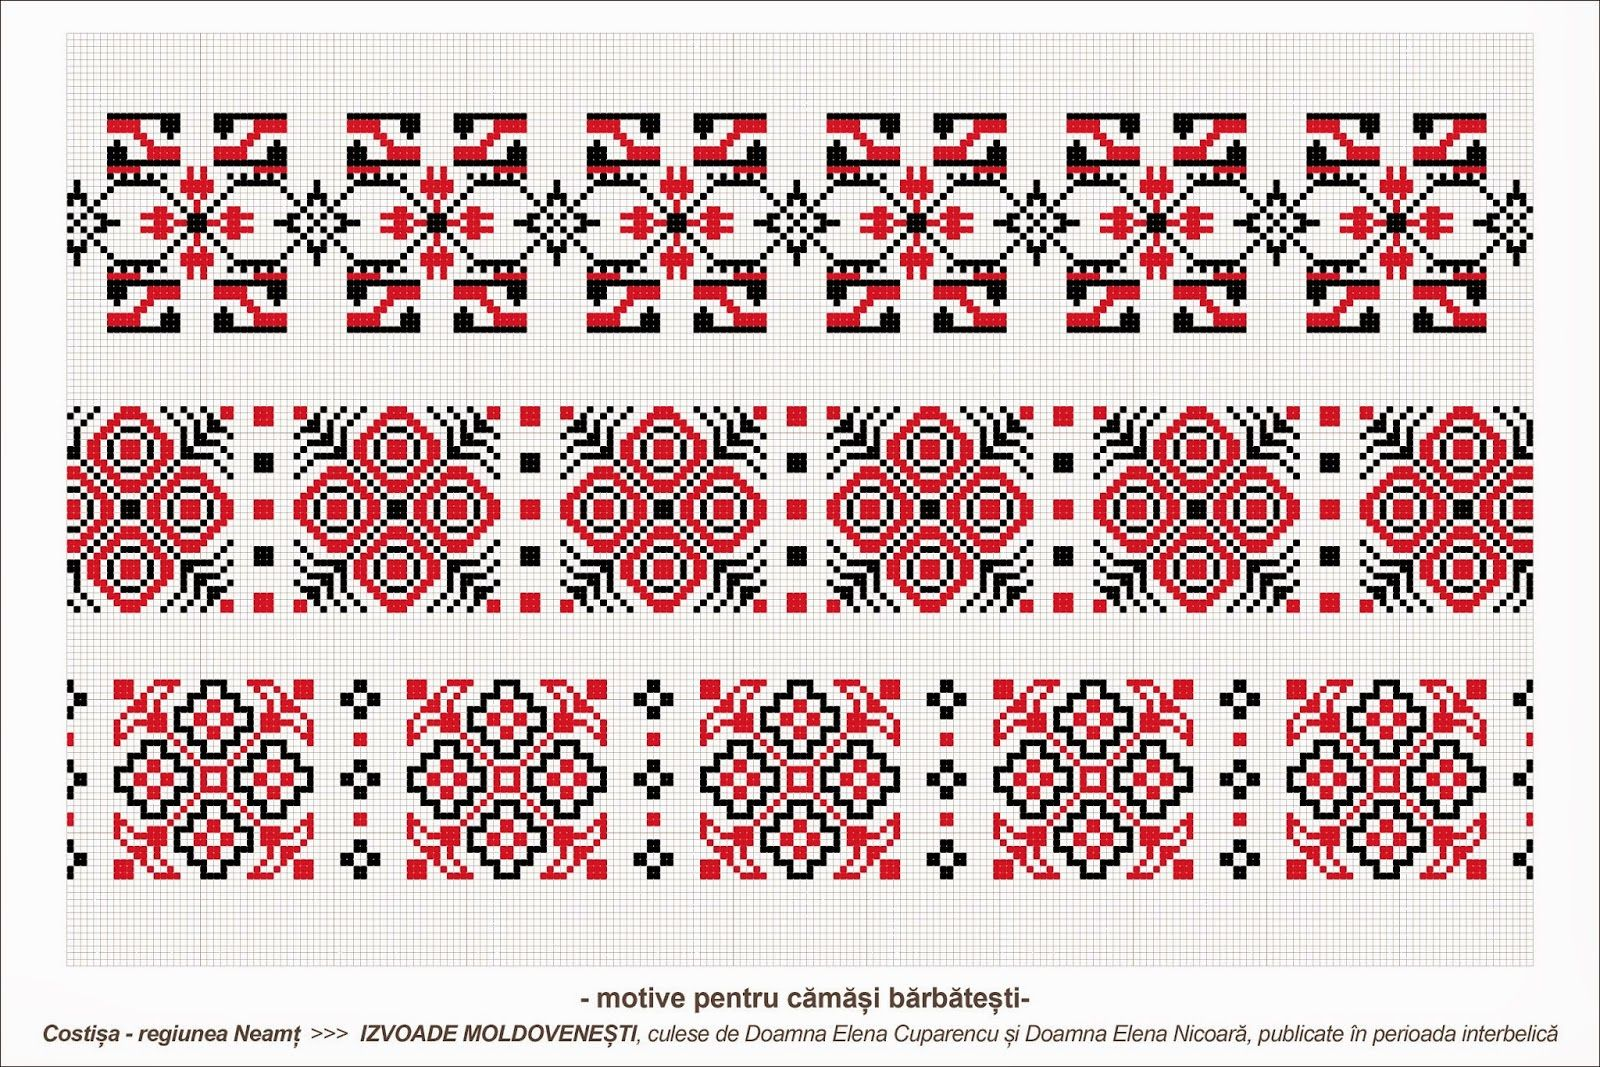 Semne Cusute Romanian Traditional Motifs Moldova Neamt Costisa